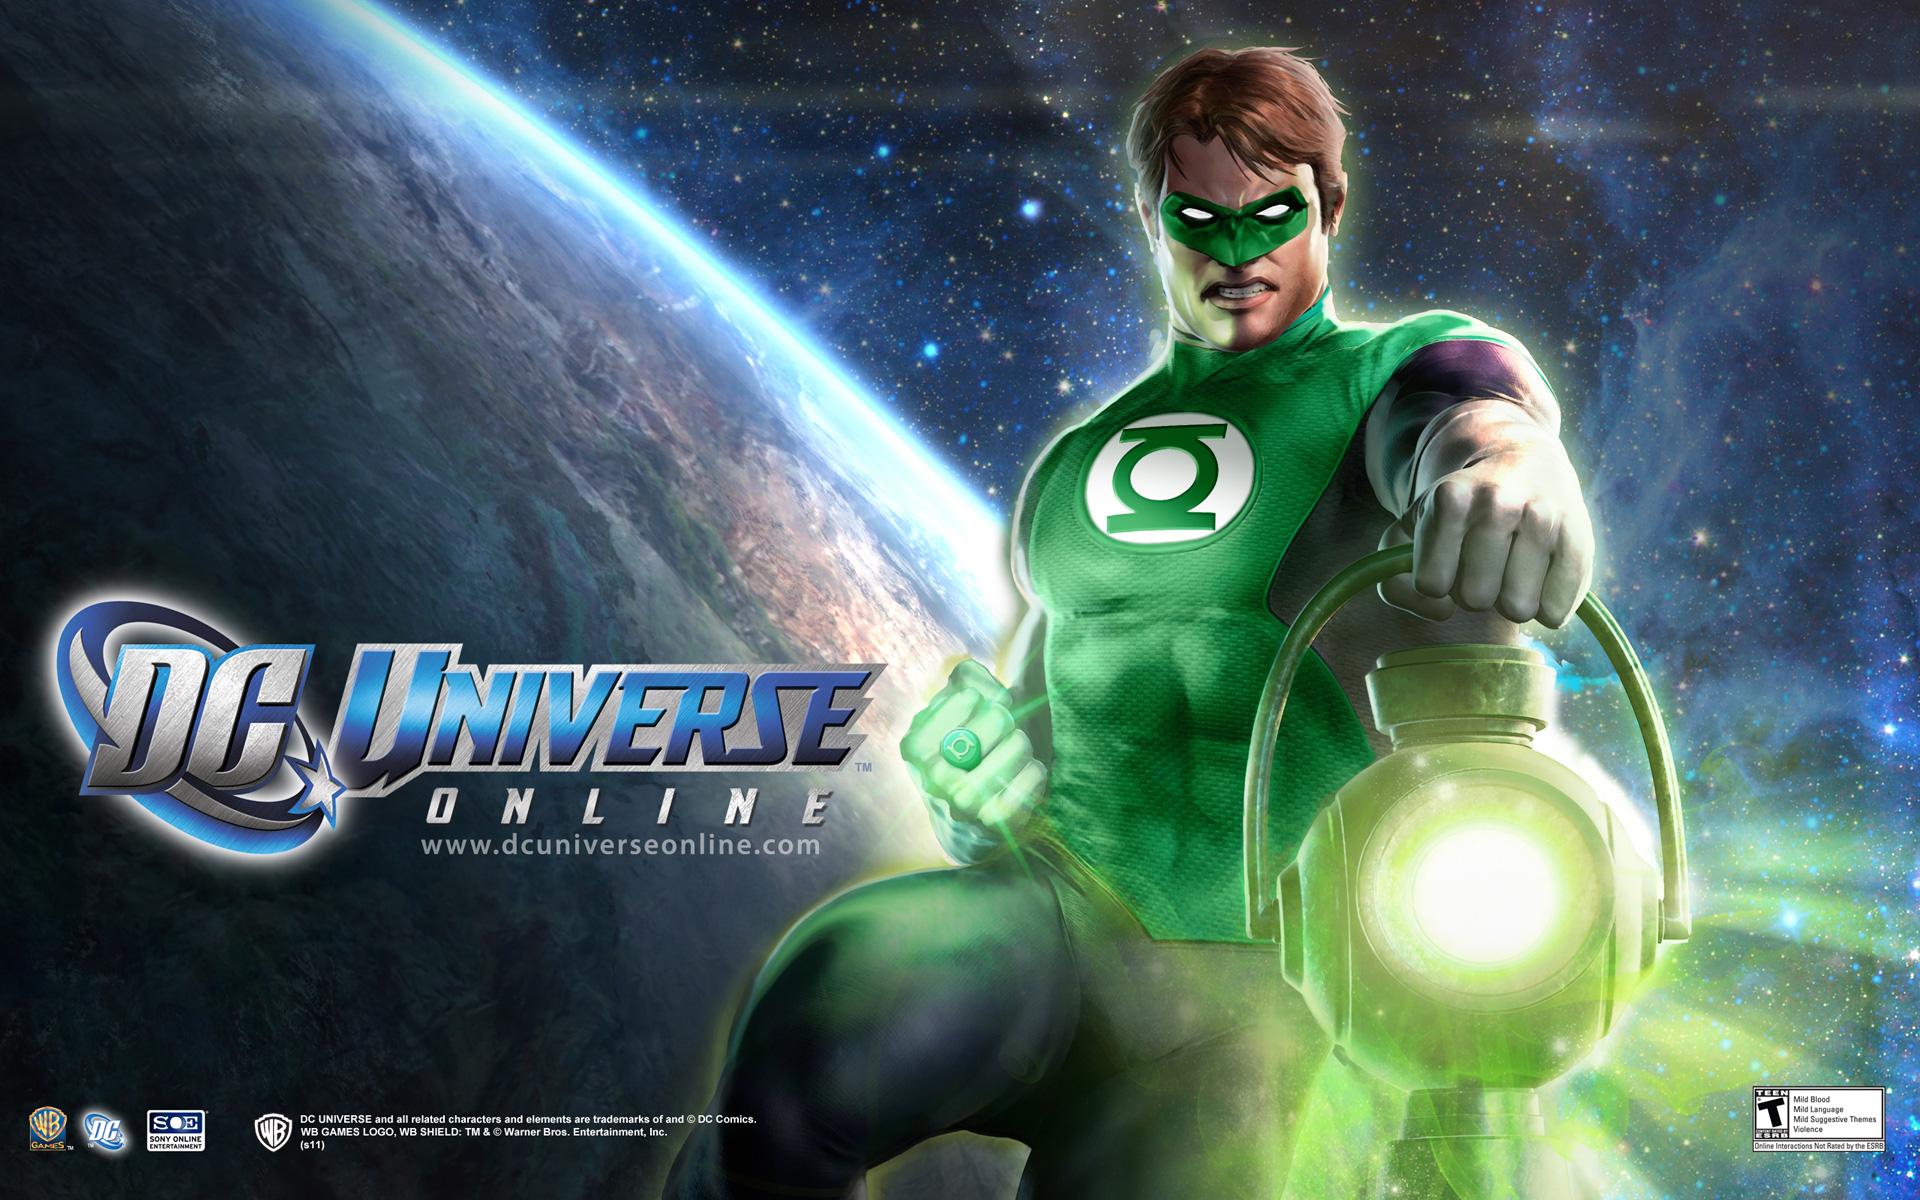 DC Universe Online Wallpaper in 1920x1200 1920x1200